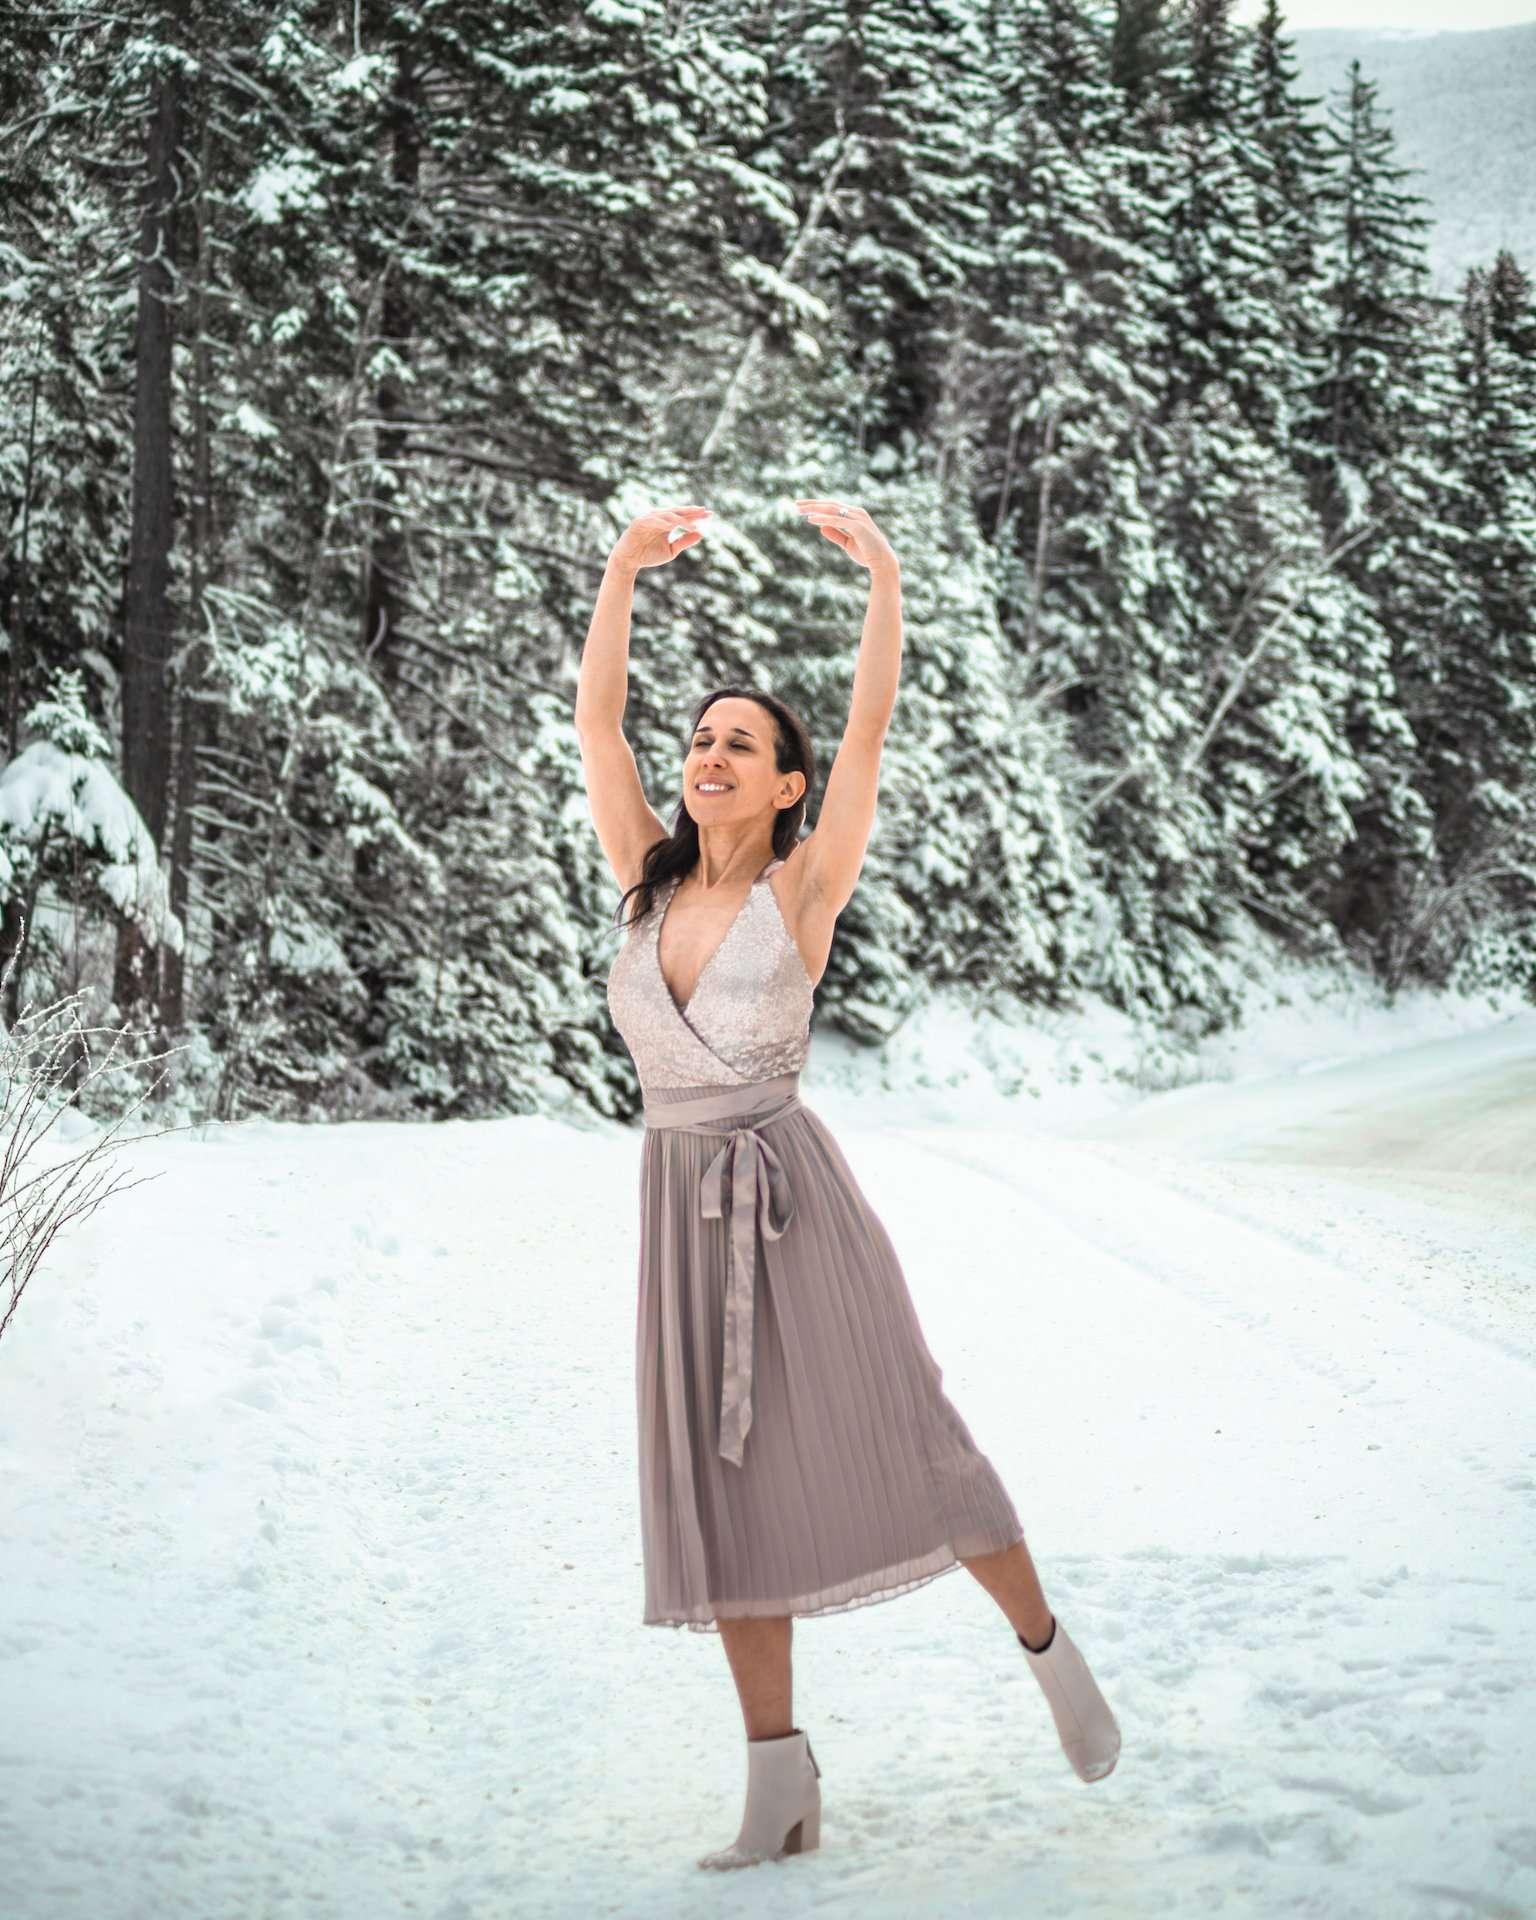 girl in dress dancing in snow